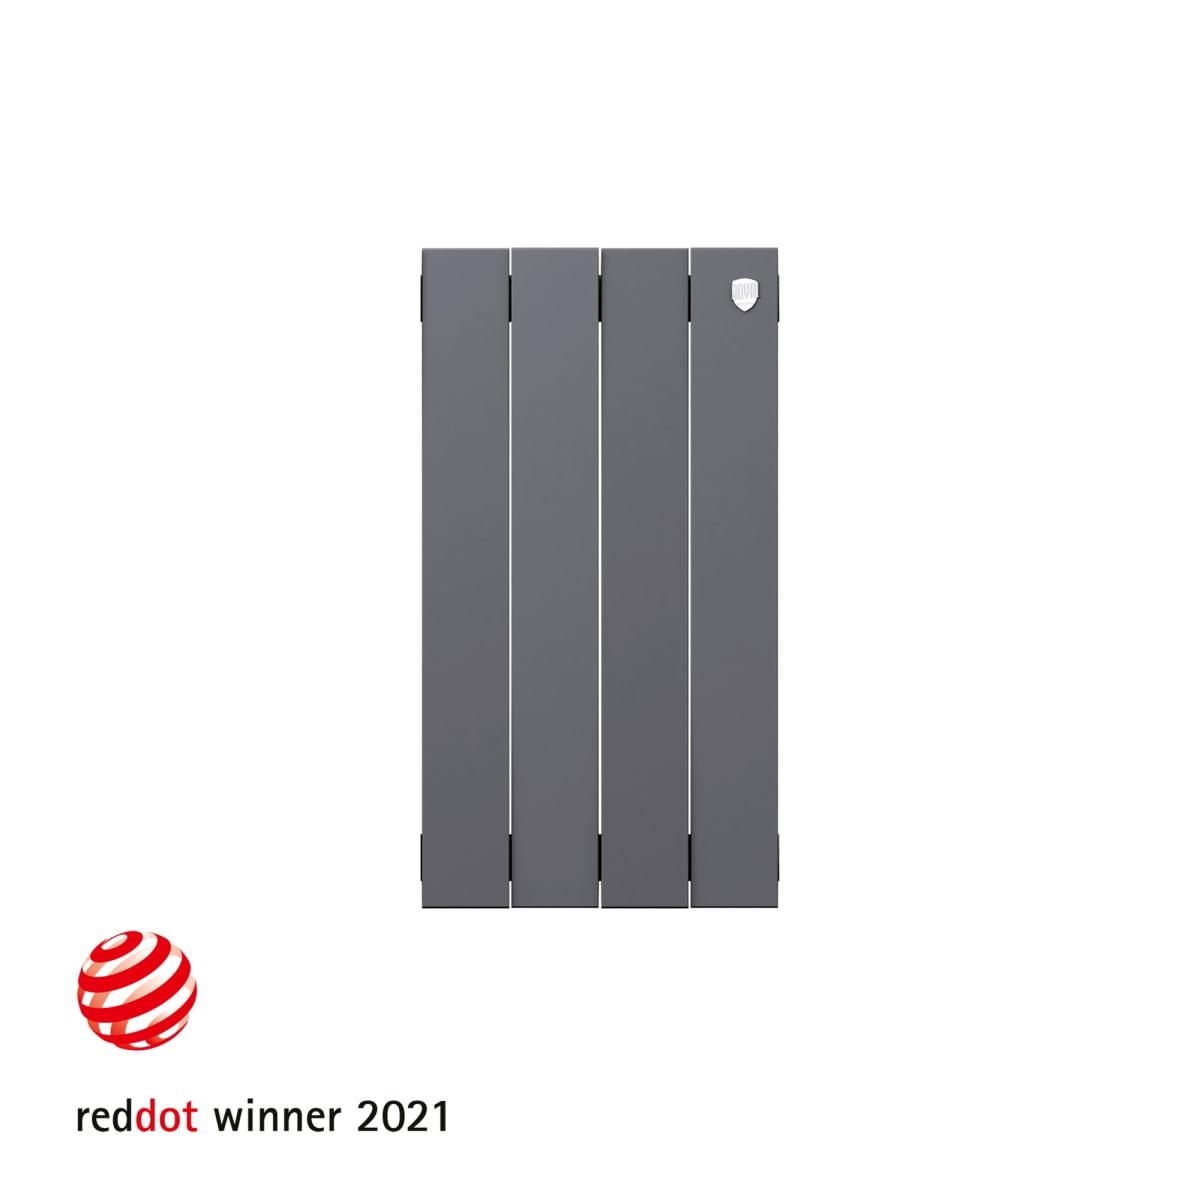 Радиатор Royal Thermo PianoForte 500 4 секции, Silver Satin